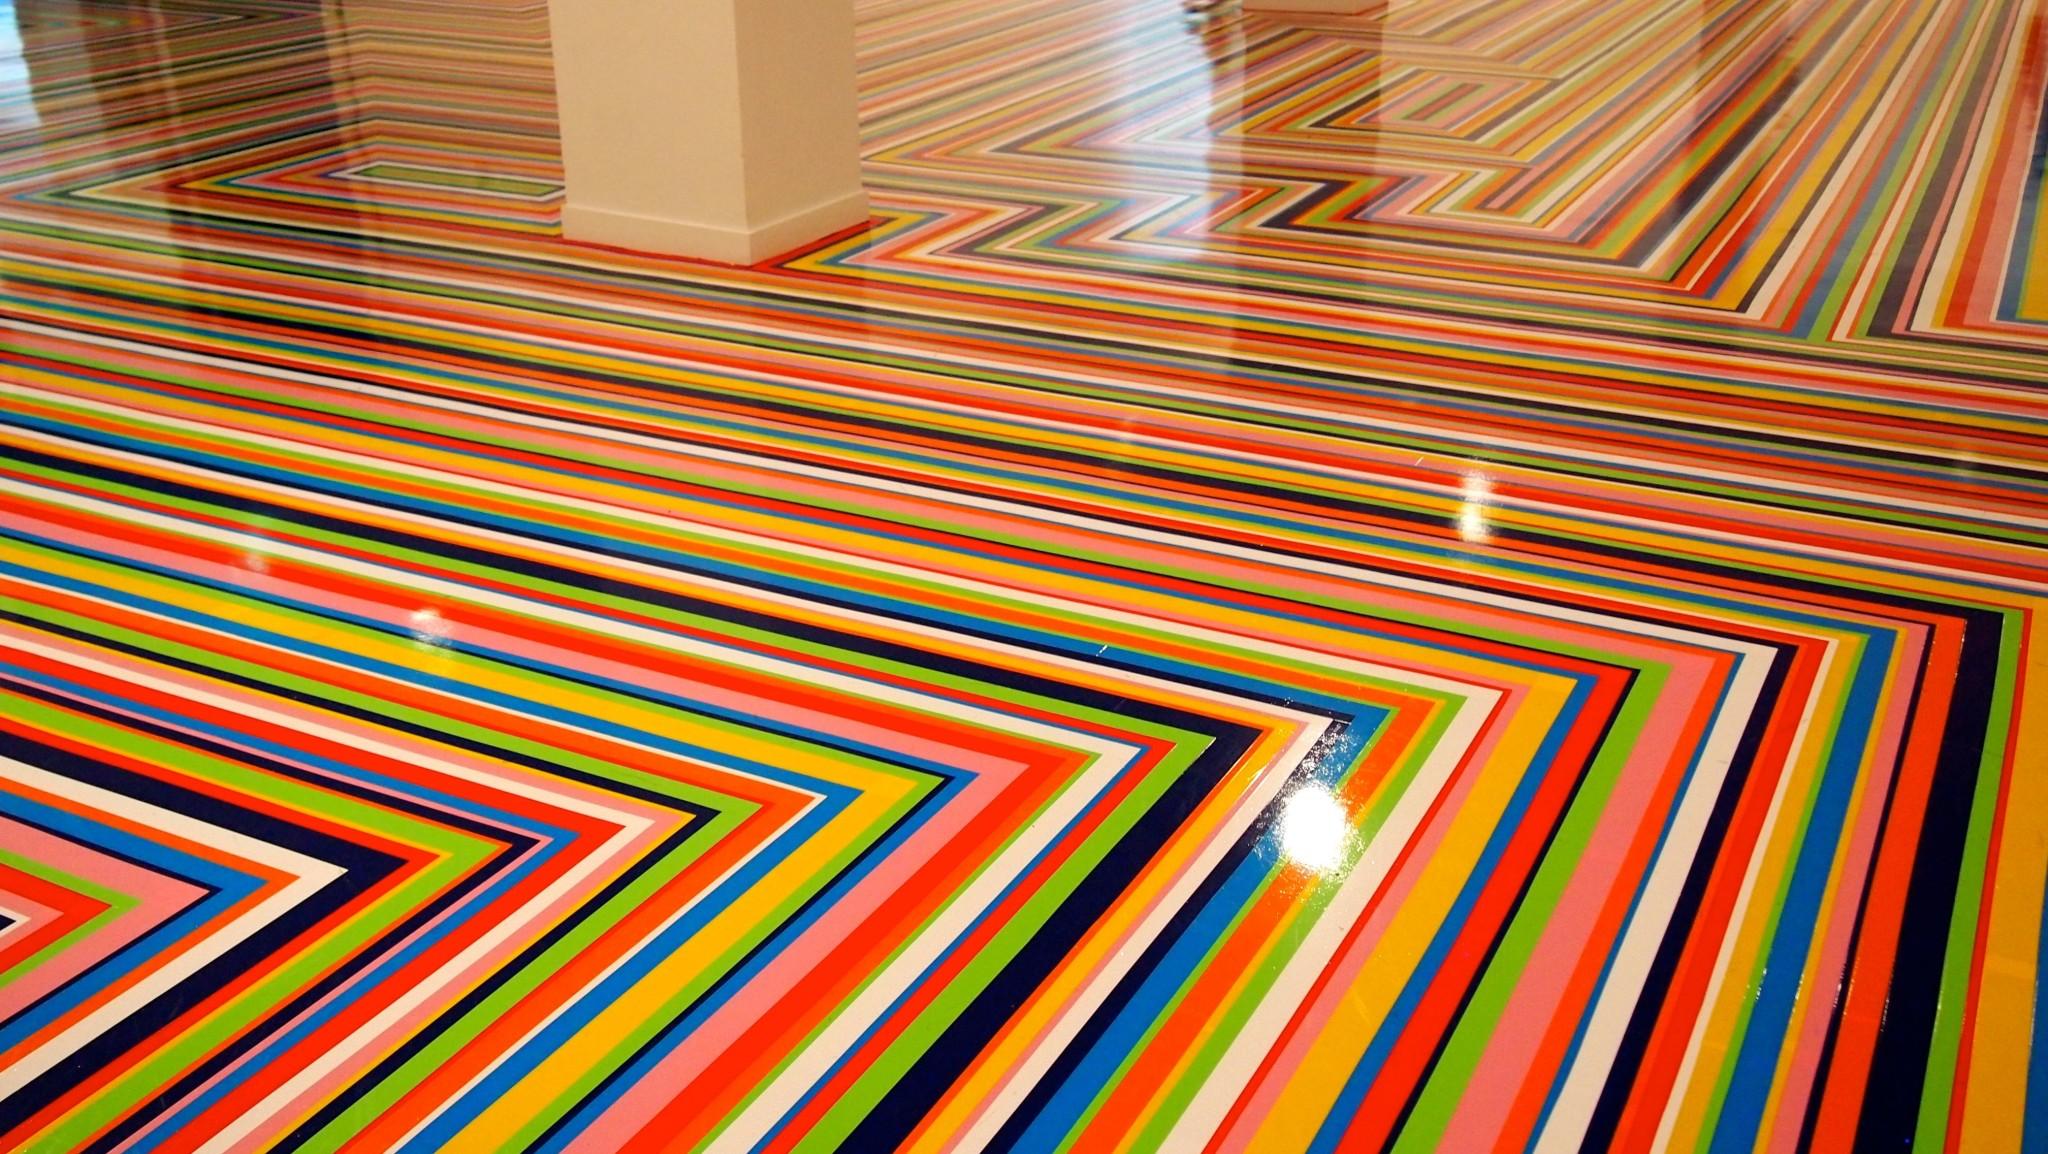 Sydney Biennale 2014